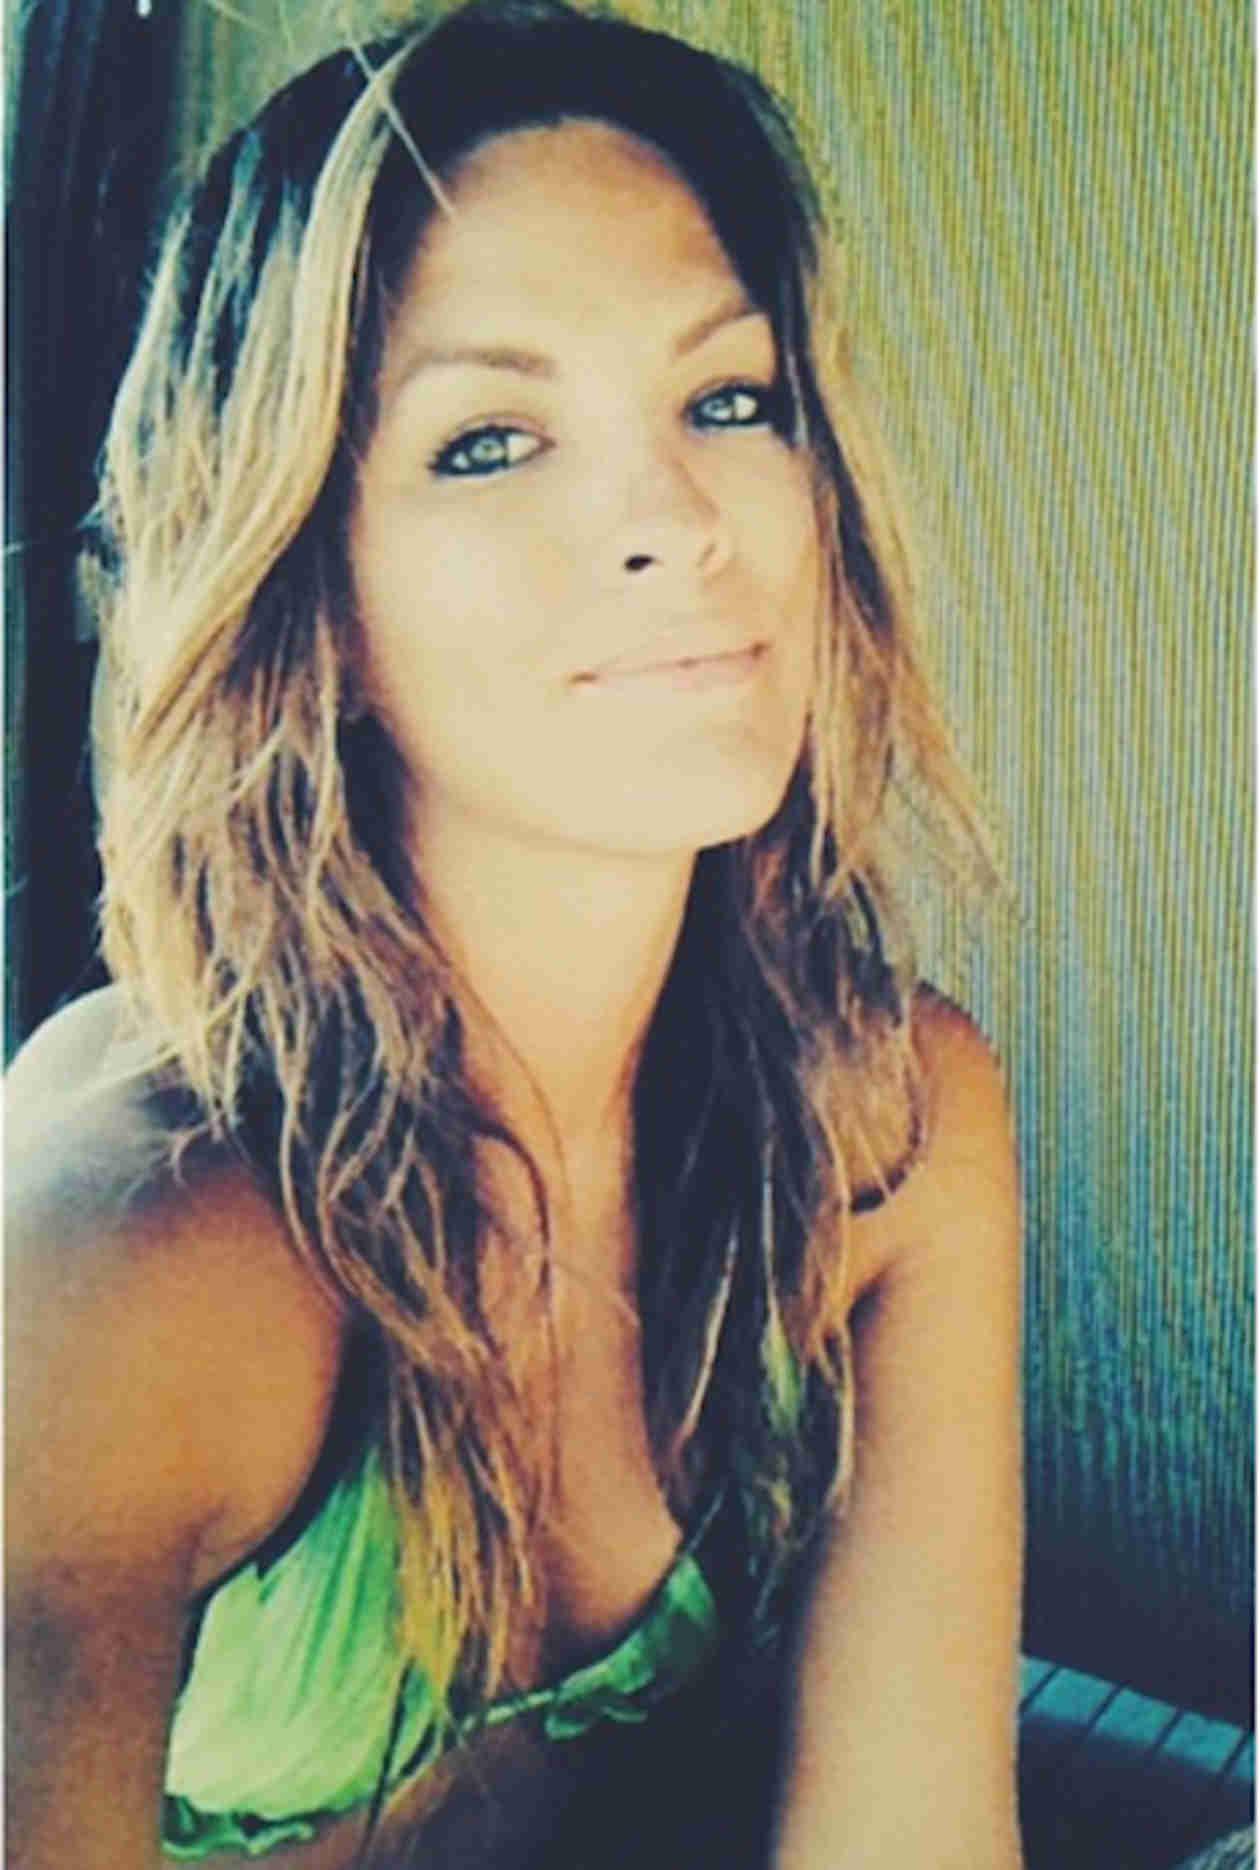 Becca tilley 2015 bachelor contestant